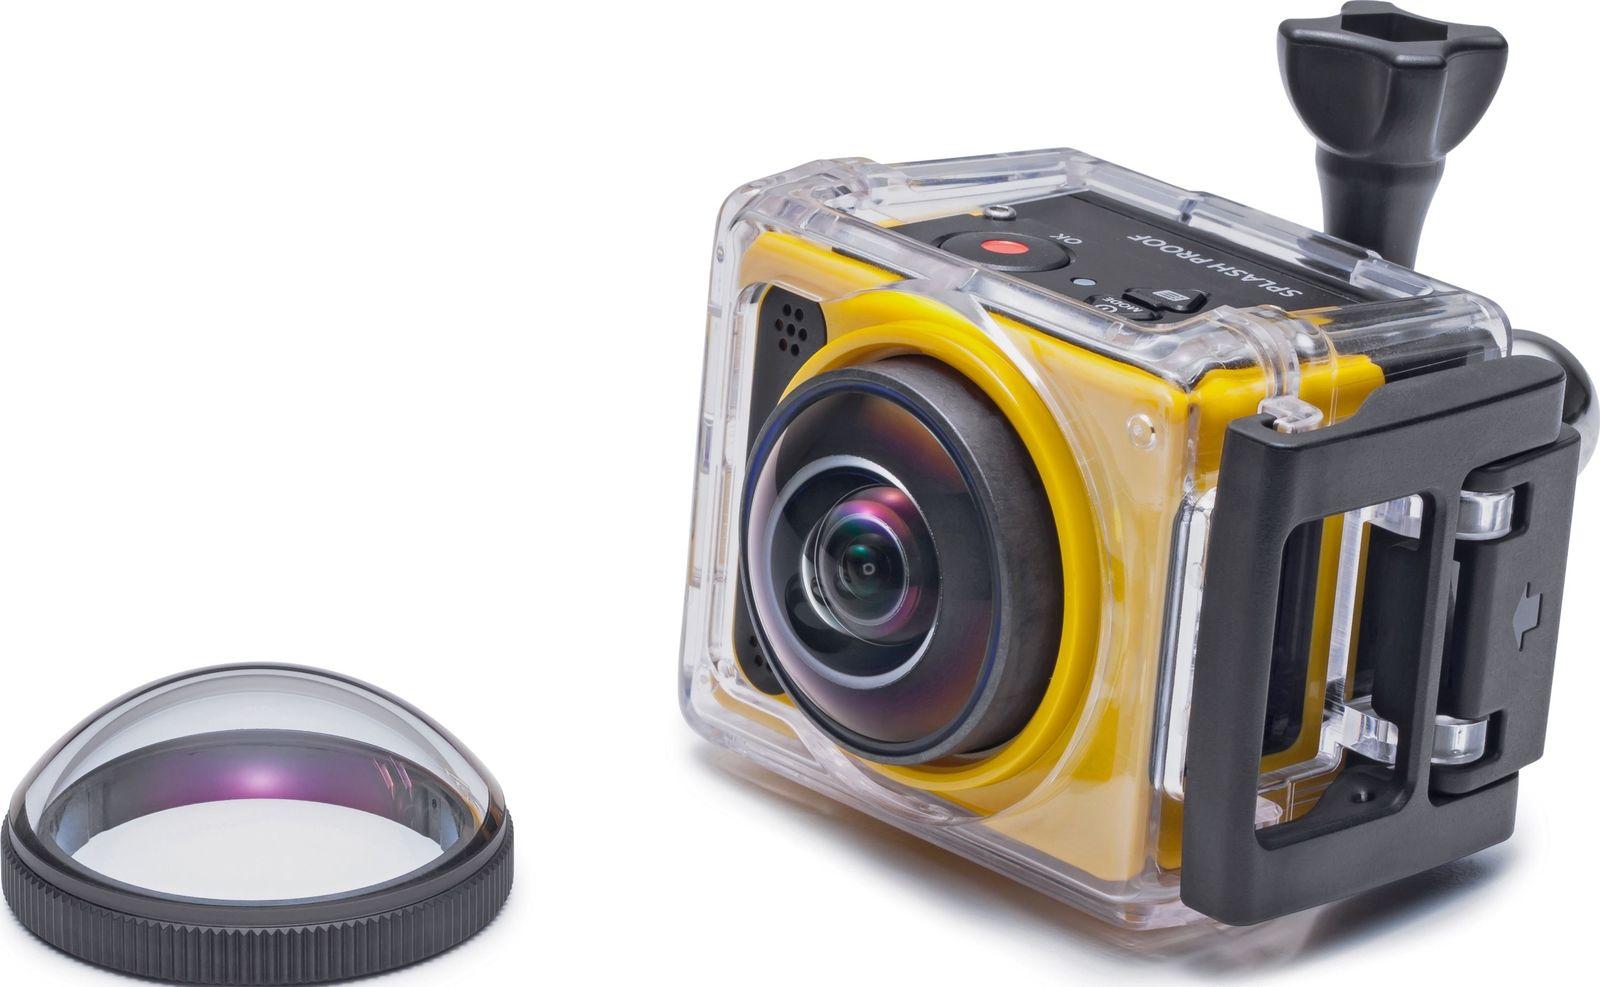 Kodak SP360 (1080p) Action Camera Kit - 360° Dome at Ebay Argos for £62.99